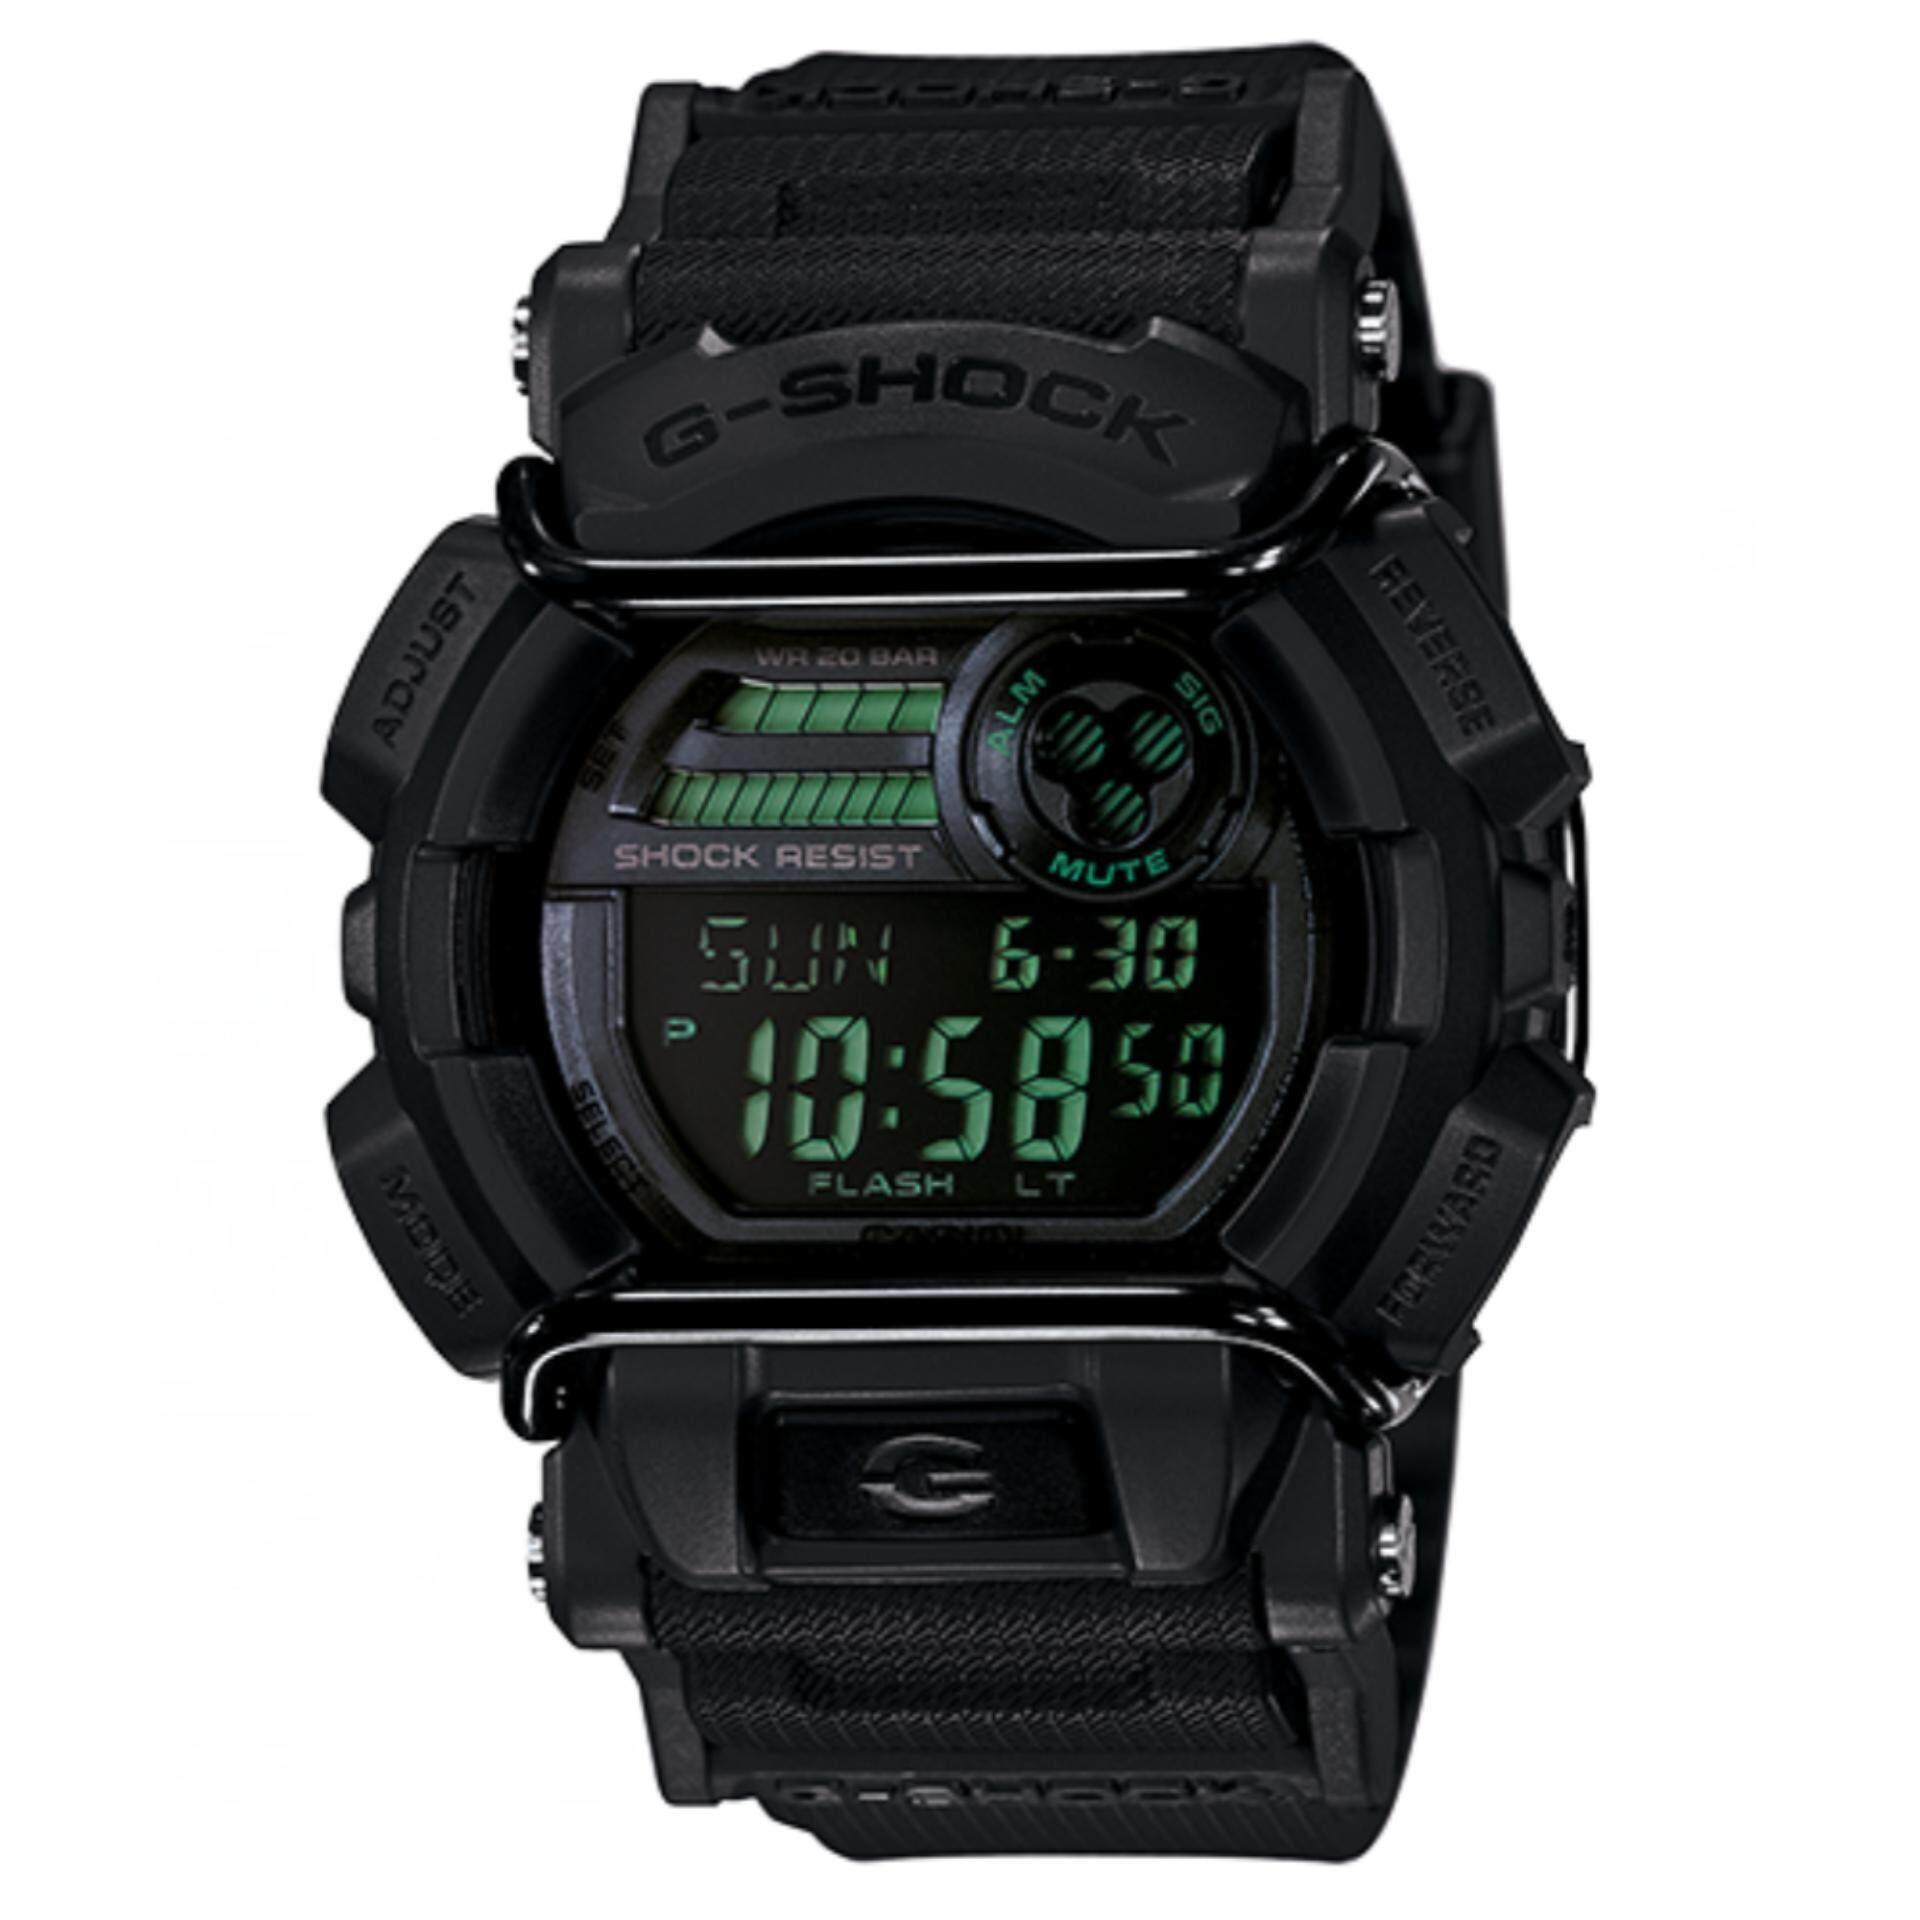 Casio G-Shock GD-400MB-1 Malaysia